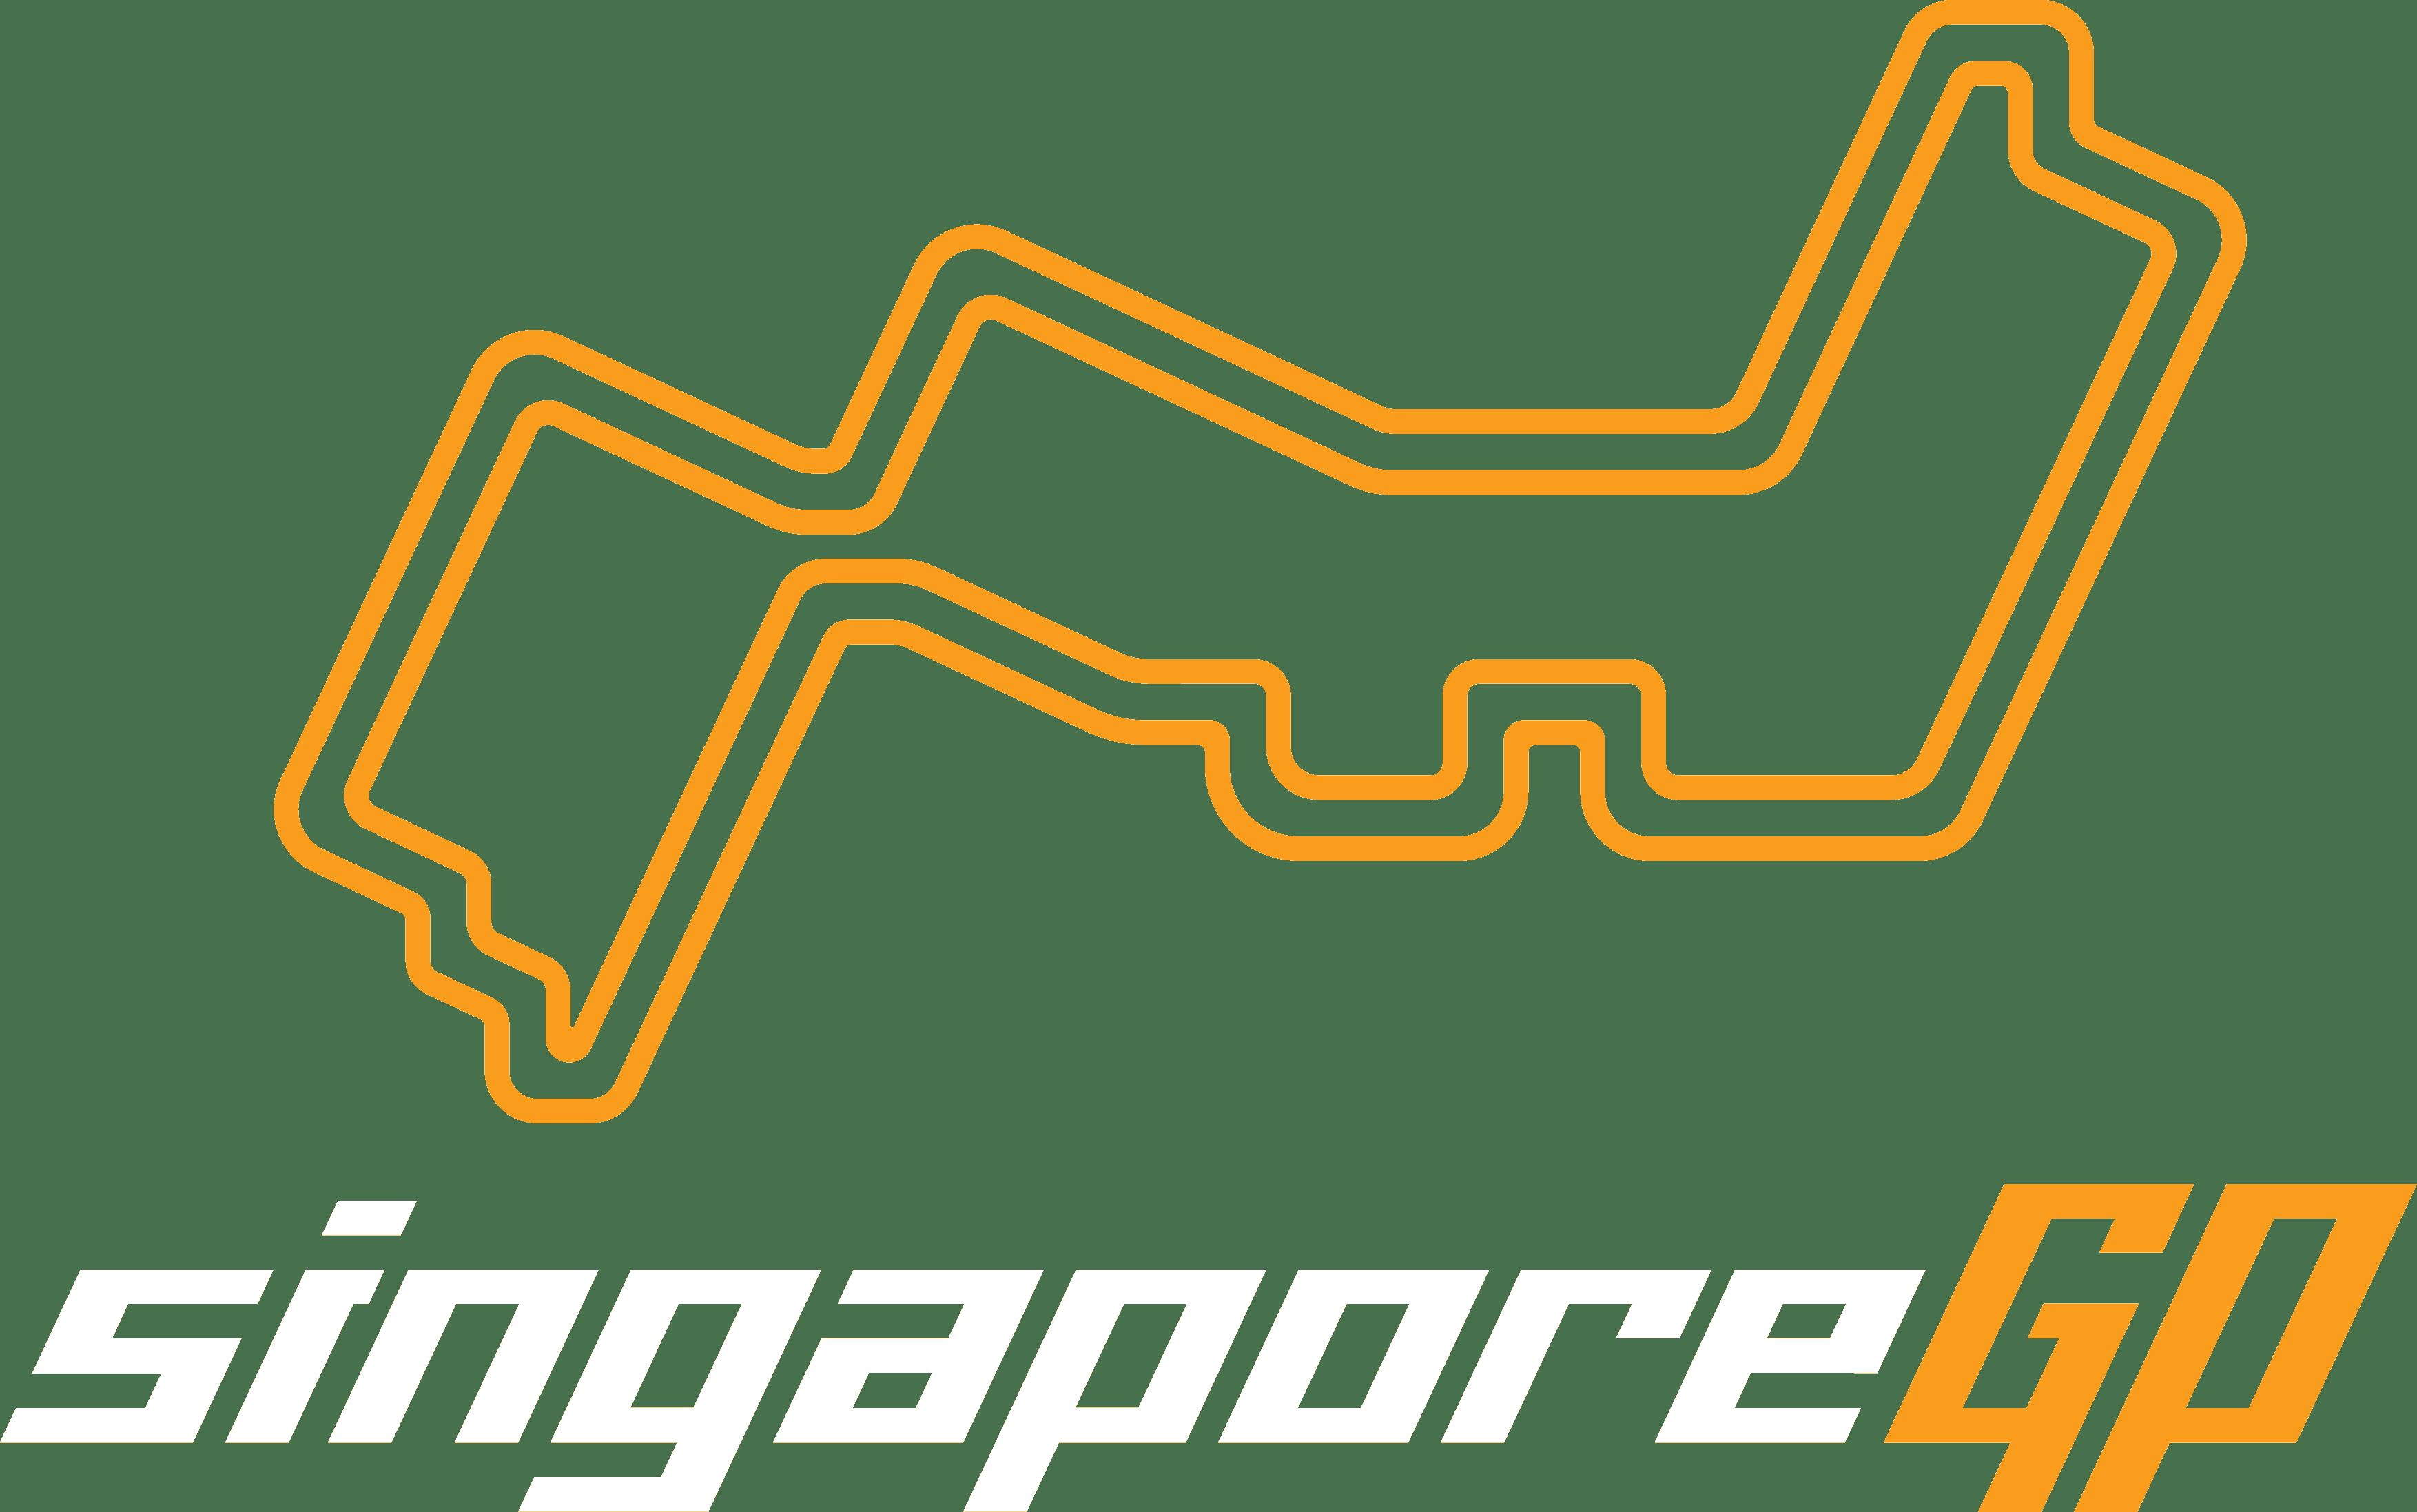 MOTOSPORTS TRAVEL | Formula 1 | MotoGP | 24 hours of Le Mans | IndyCar | Isle of Man TT